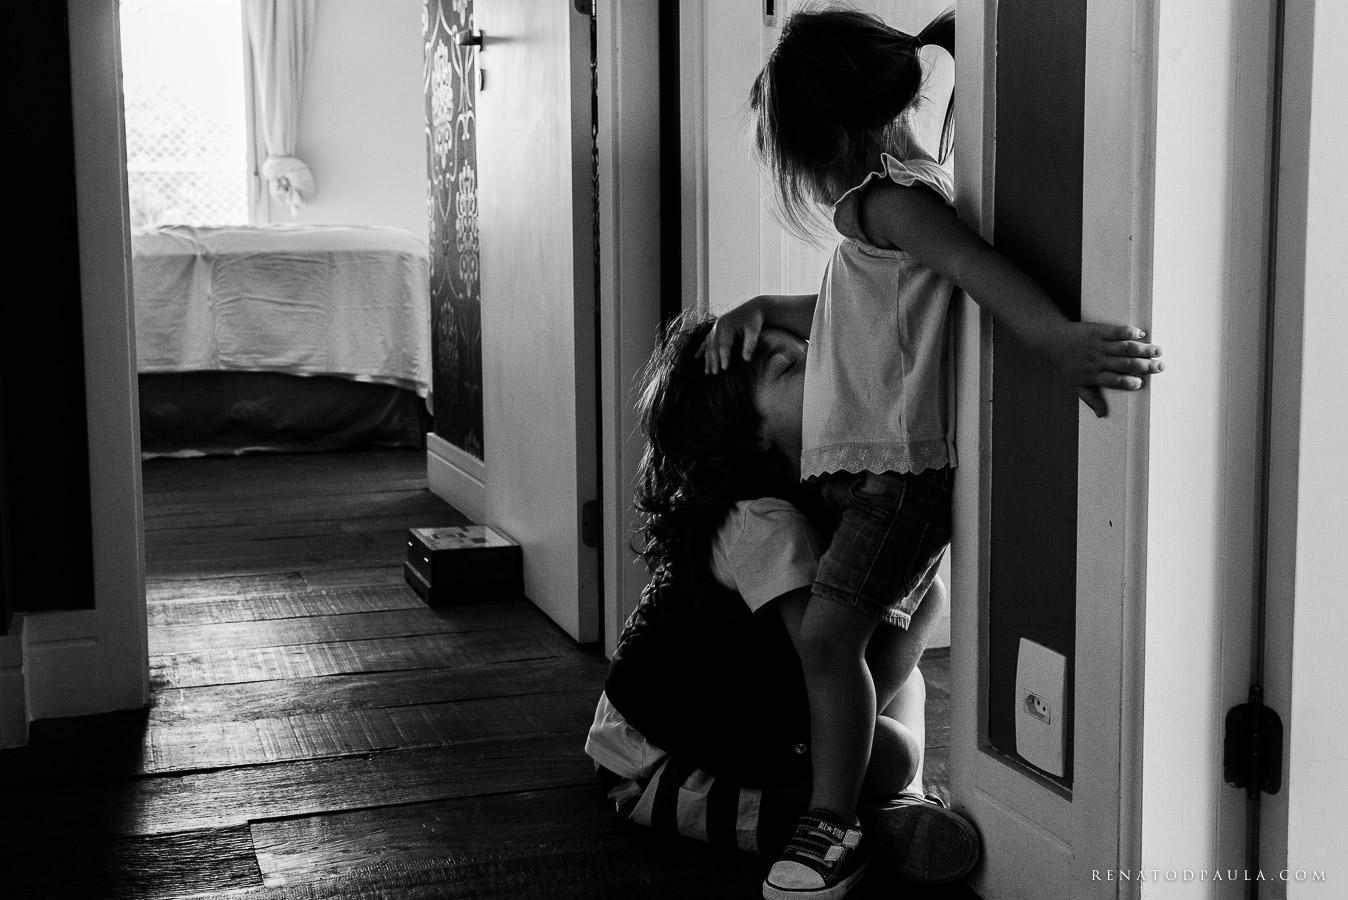 renato-dpaula-fotografia-de-familia-documental-9